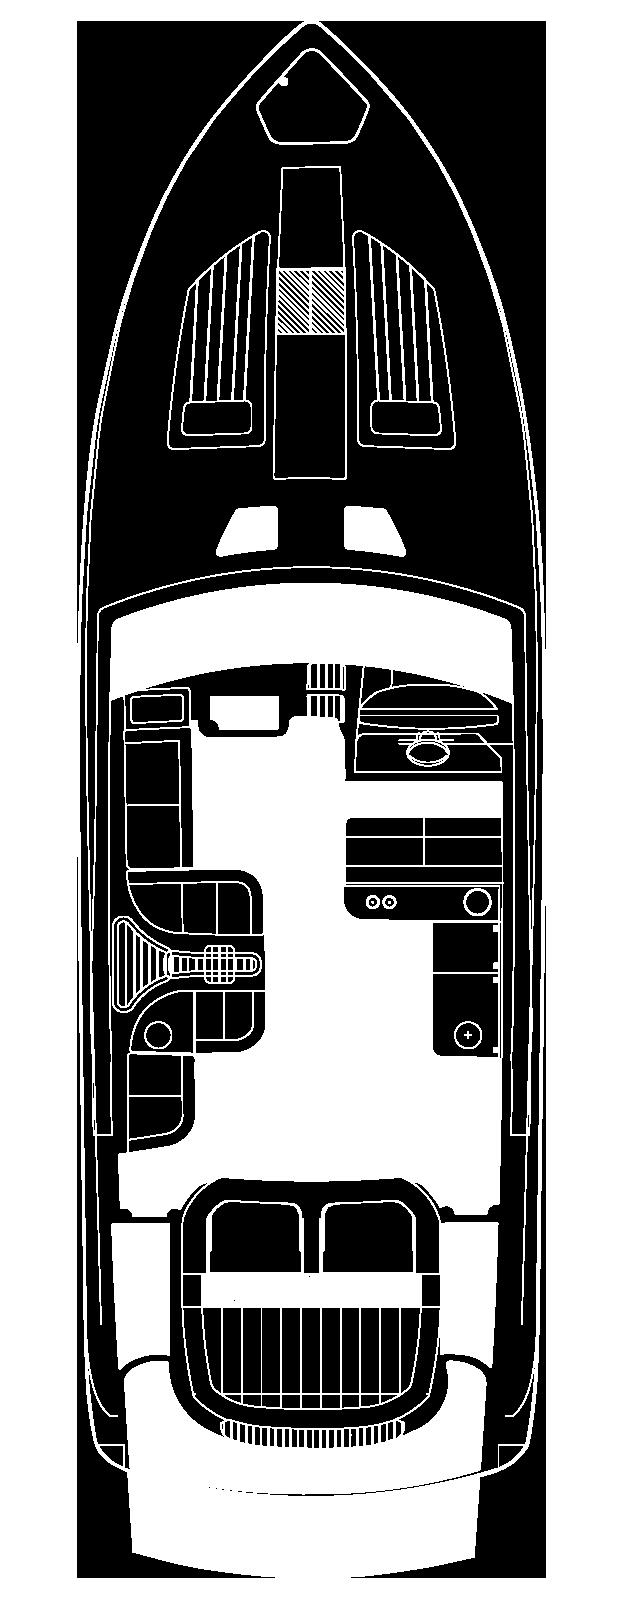 A40 Coupe Floorplan